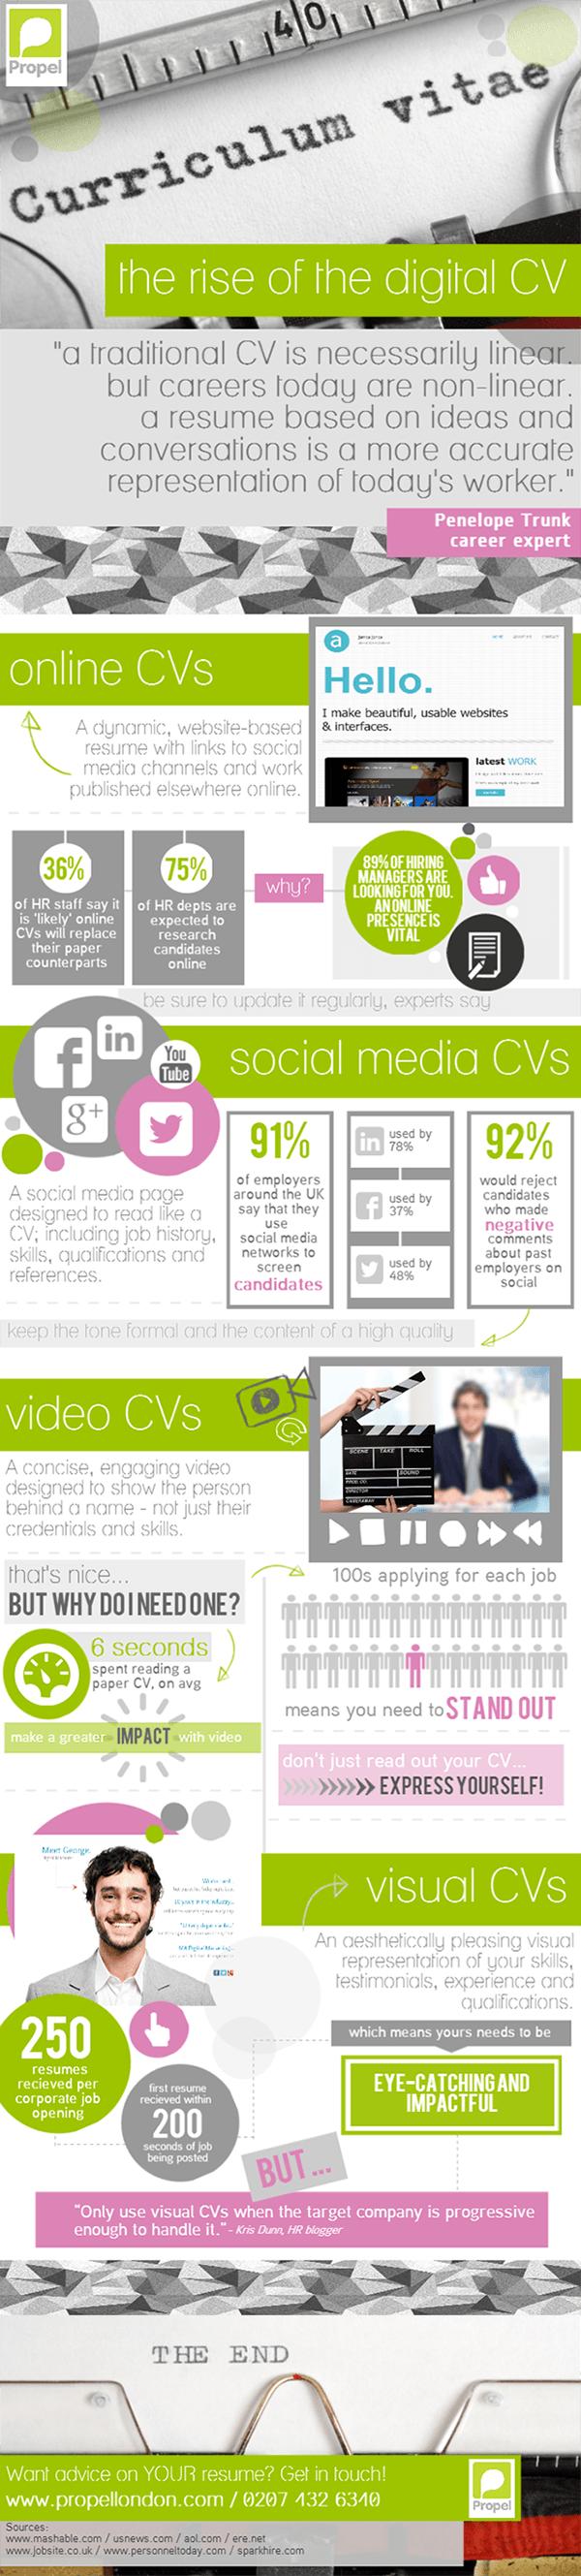 Digital Resume 11 general resume vs digital The Rise Of The Digital Cv Infographic